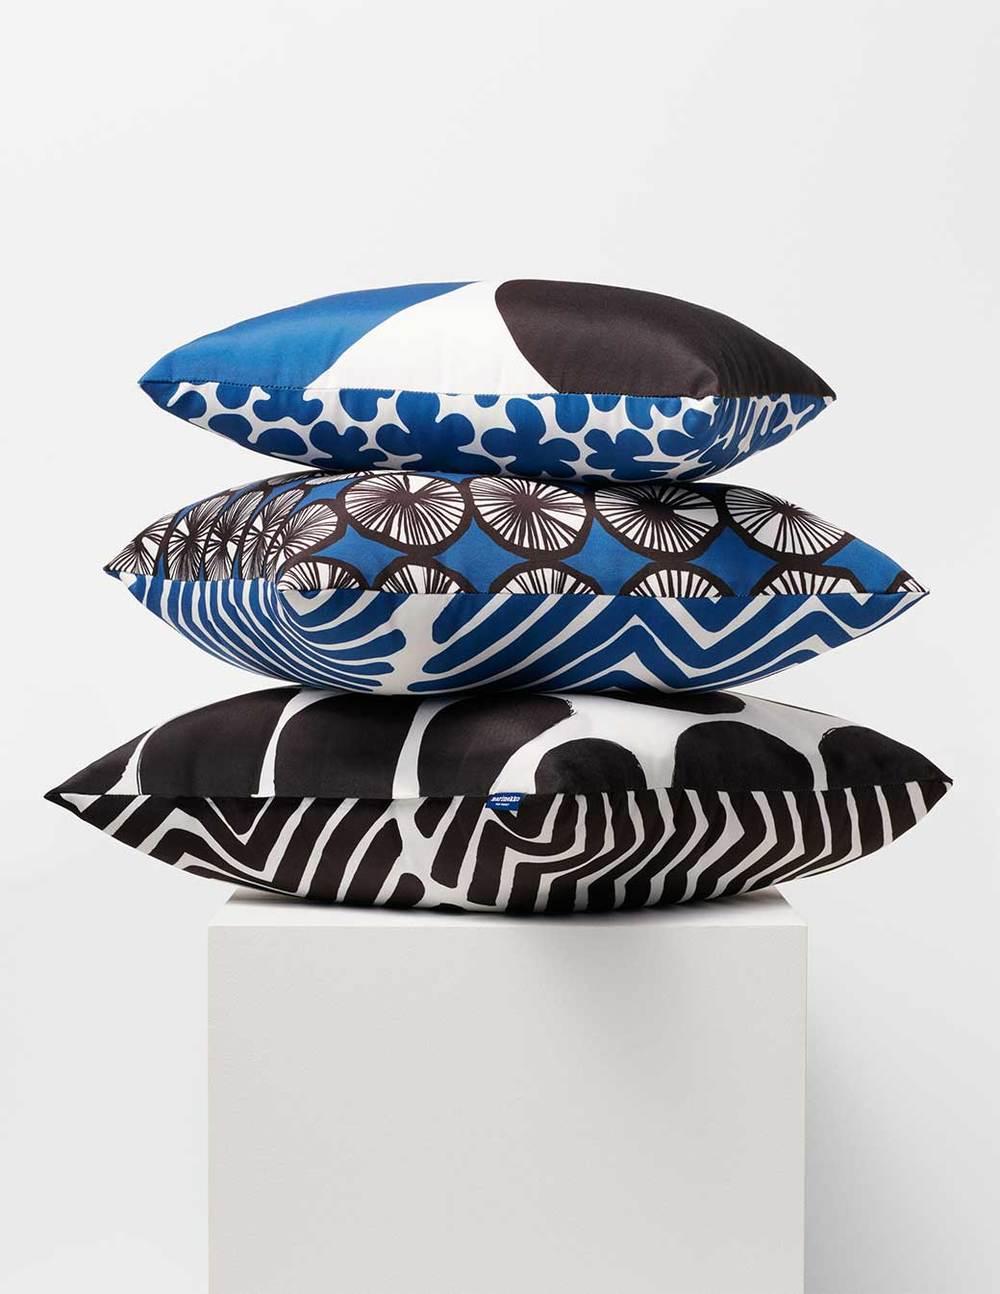 The Marimekko for Target Collection